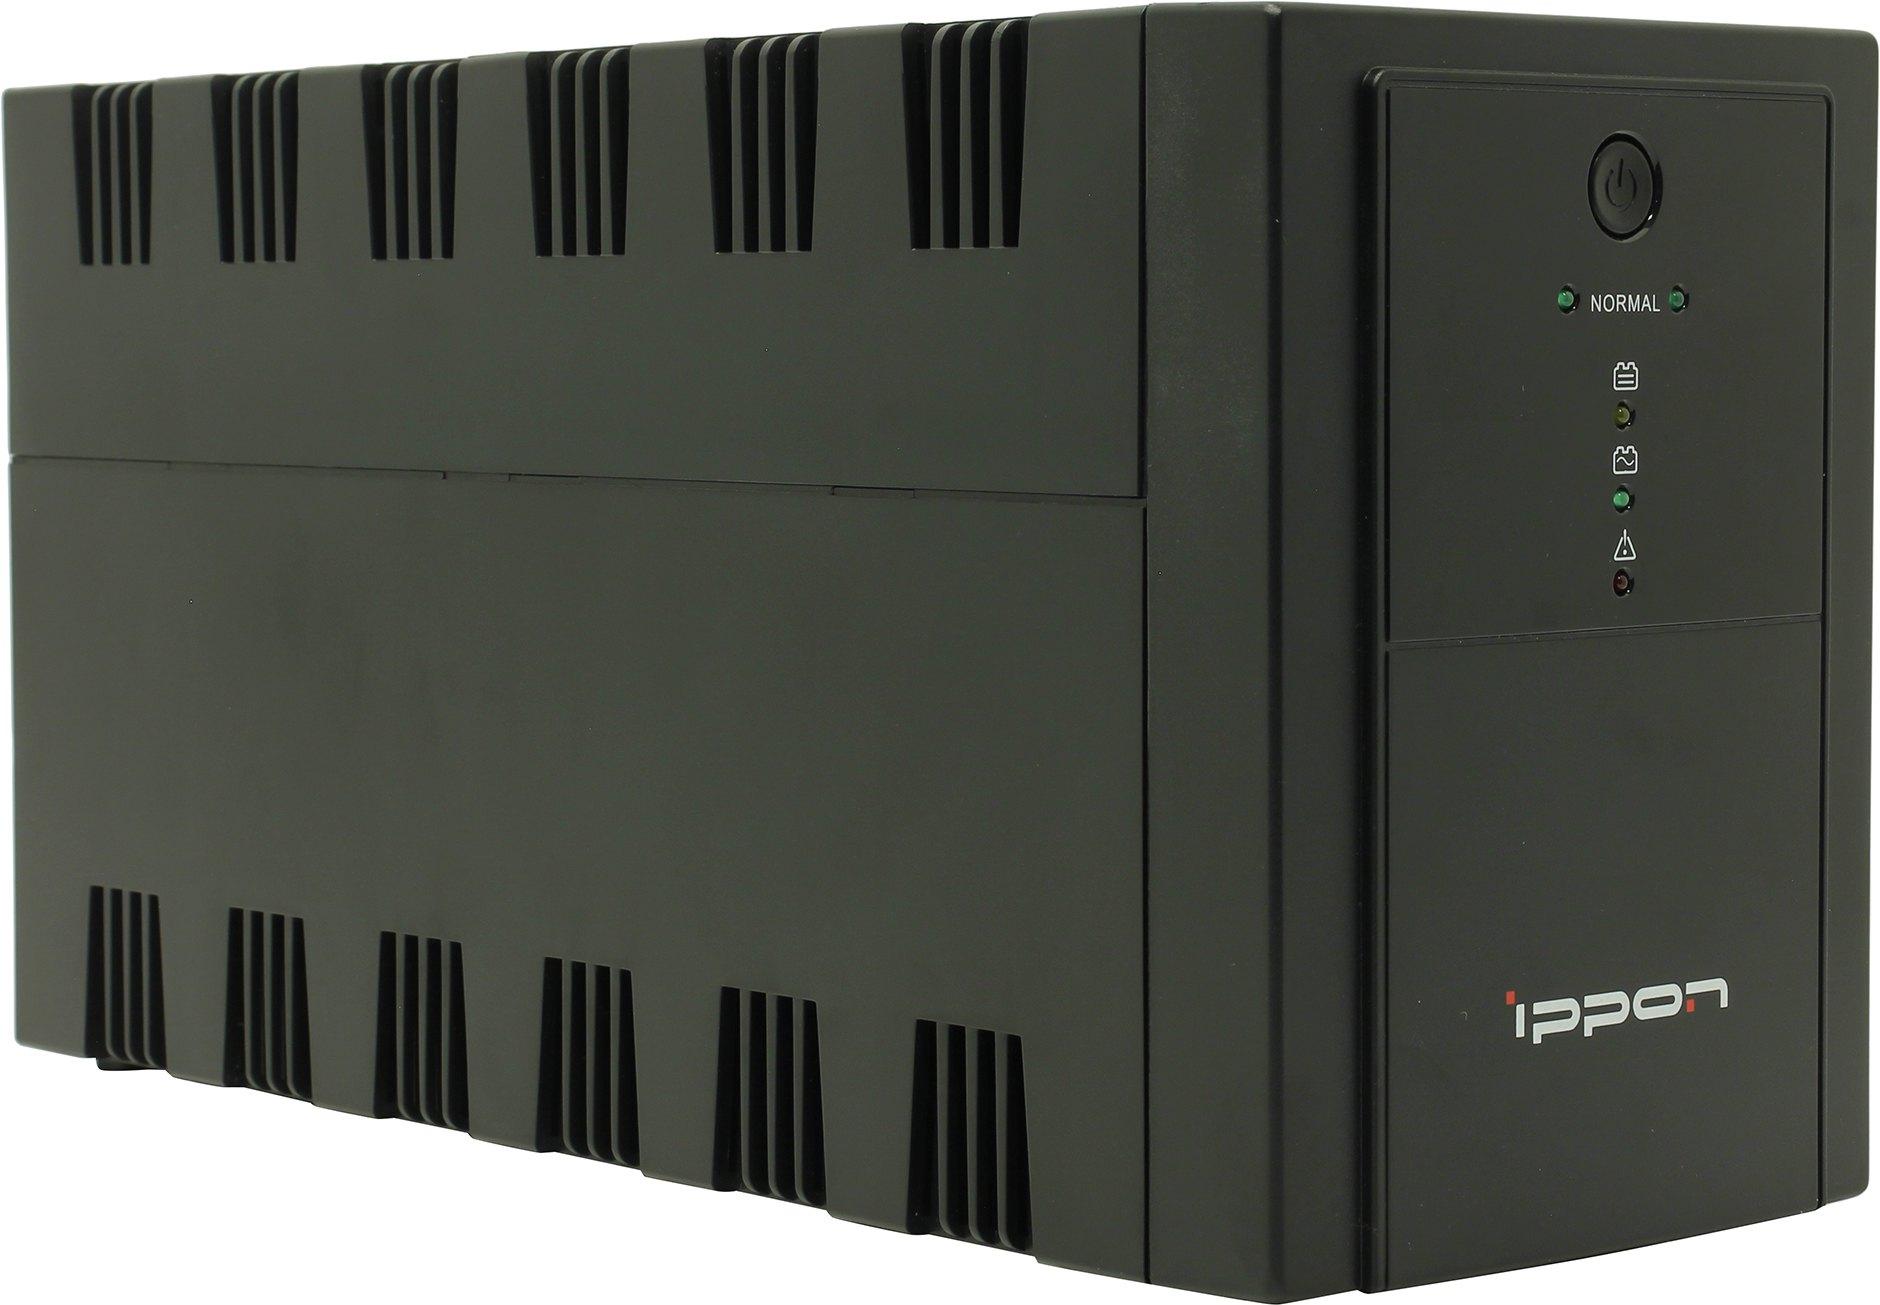 ИБП Ippon Back Basic 1500 Euro, вид основной